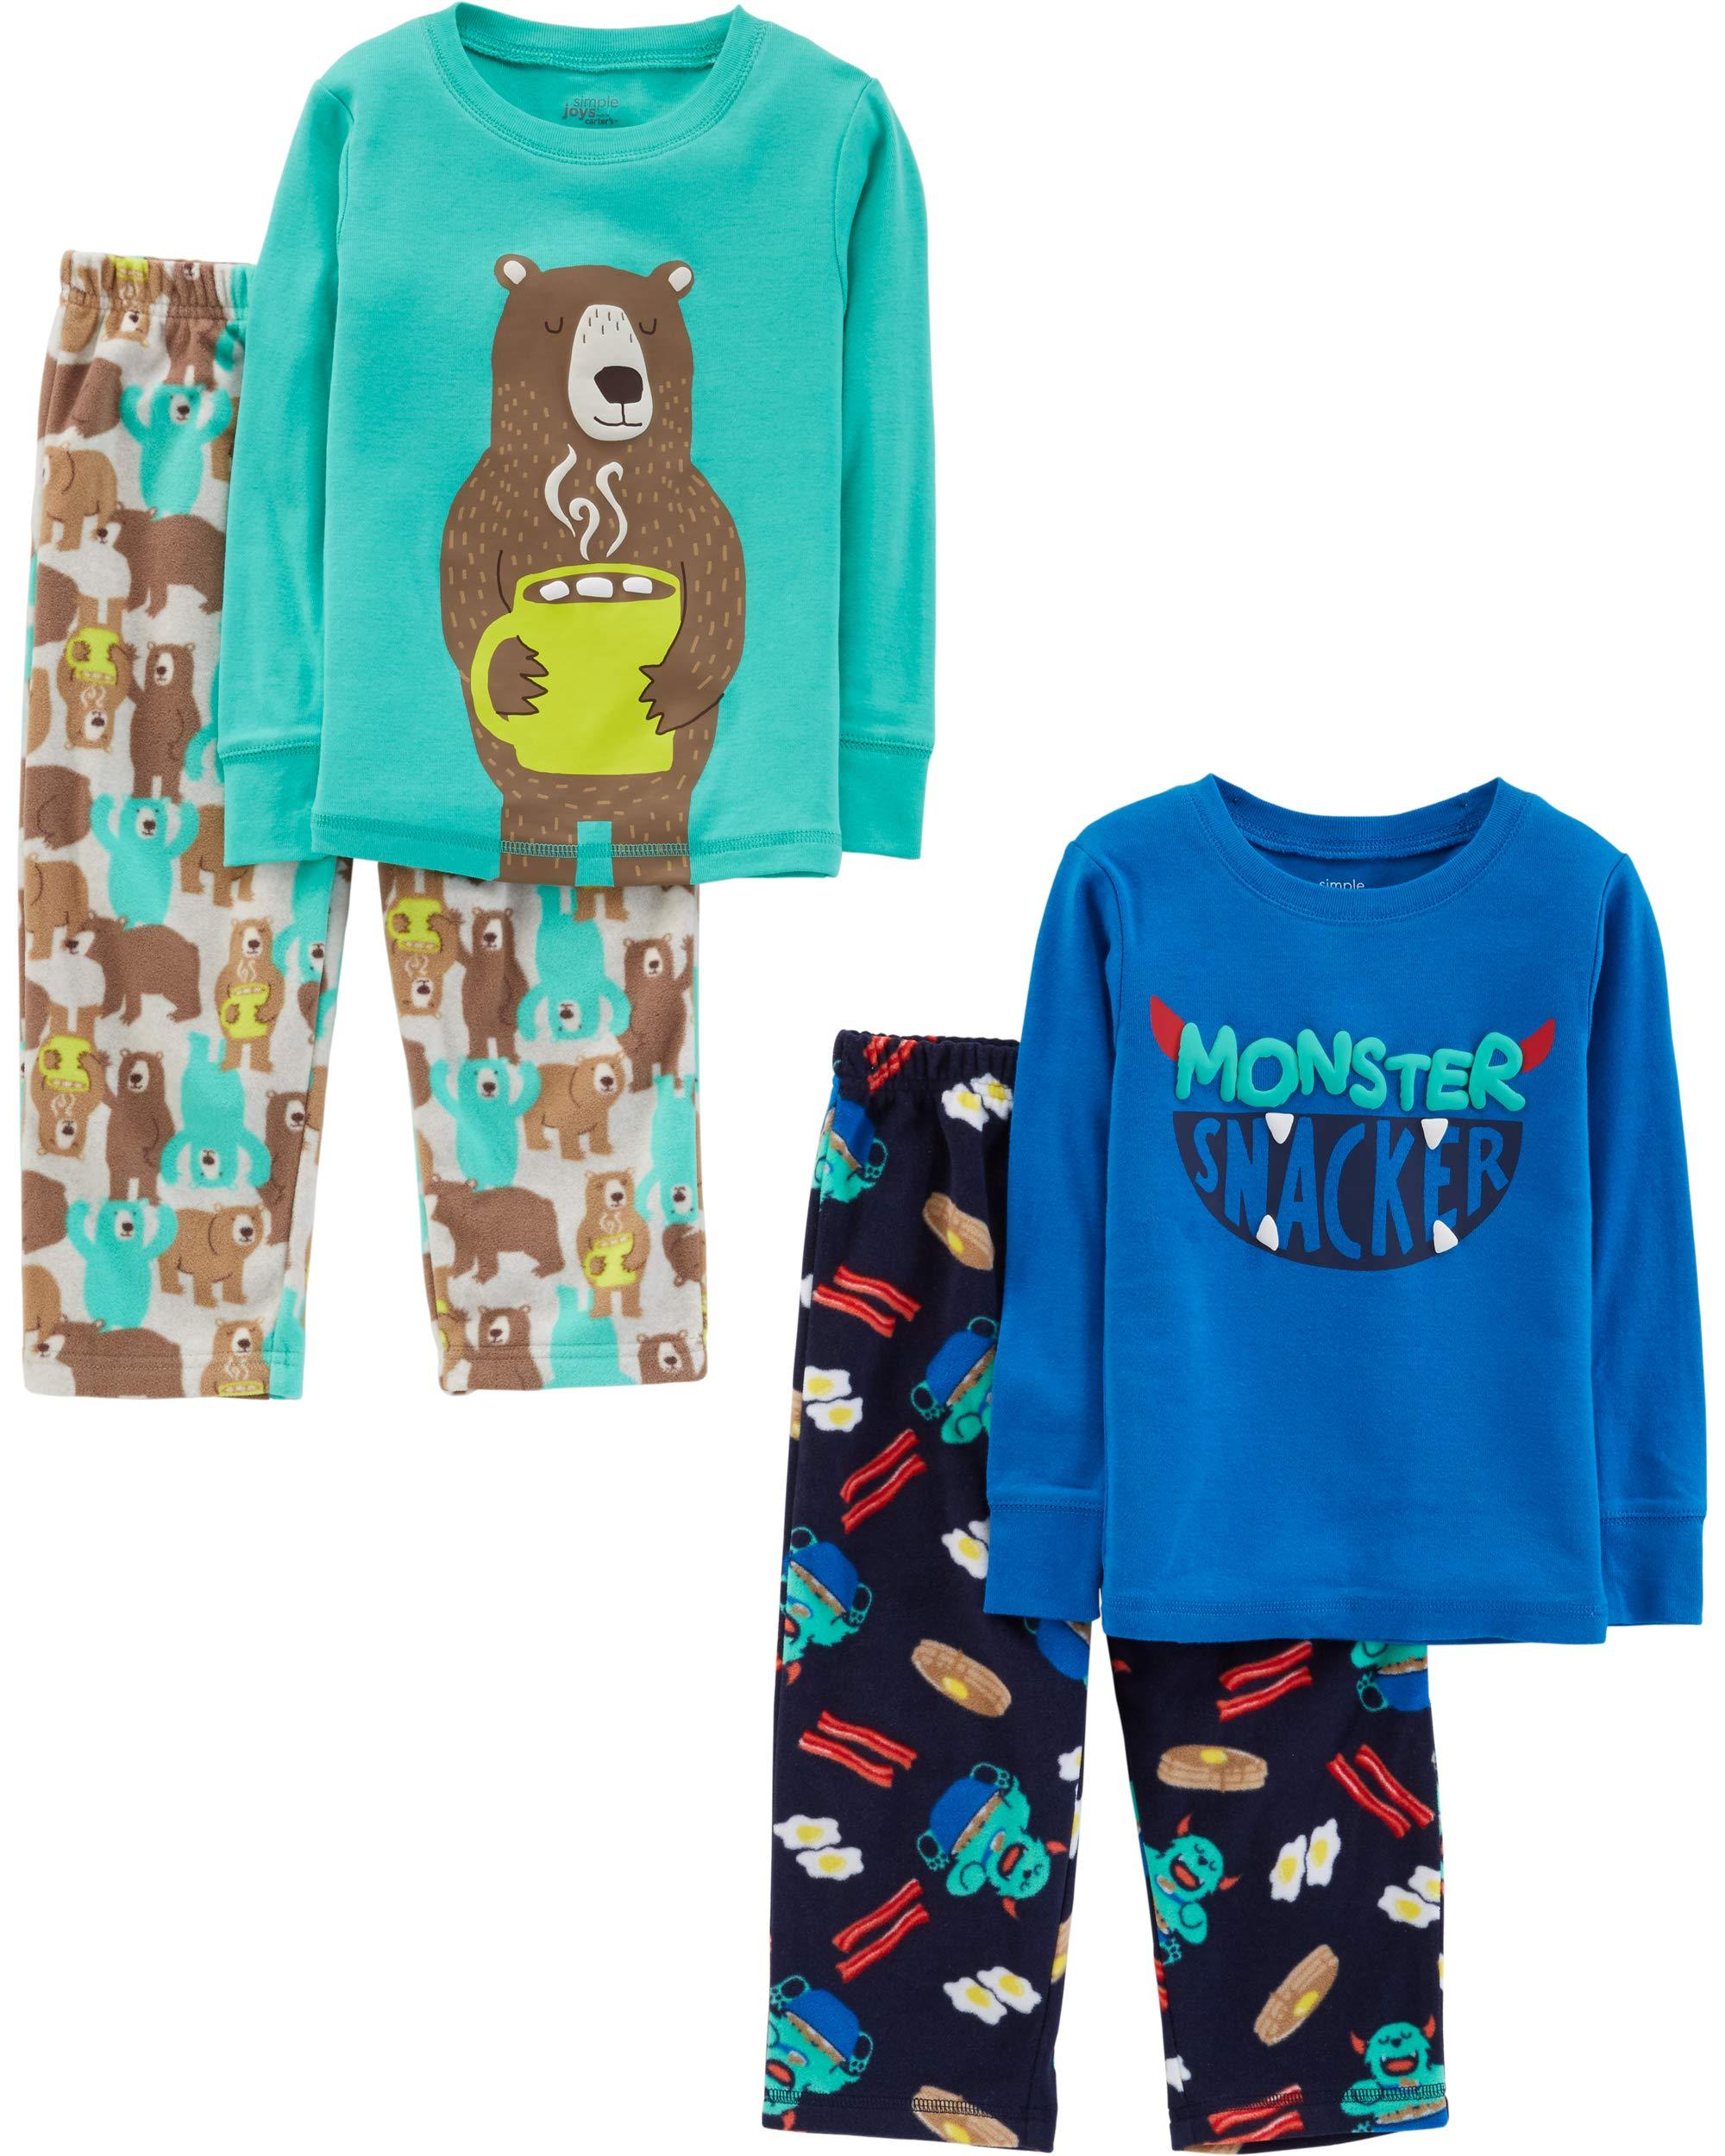 Pack of 4 Simple Joys by Carters Girls 4-Piece Pajama Set Cotton Top /& Fleece Bottom